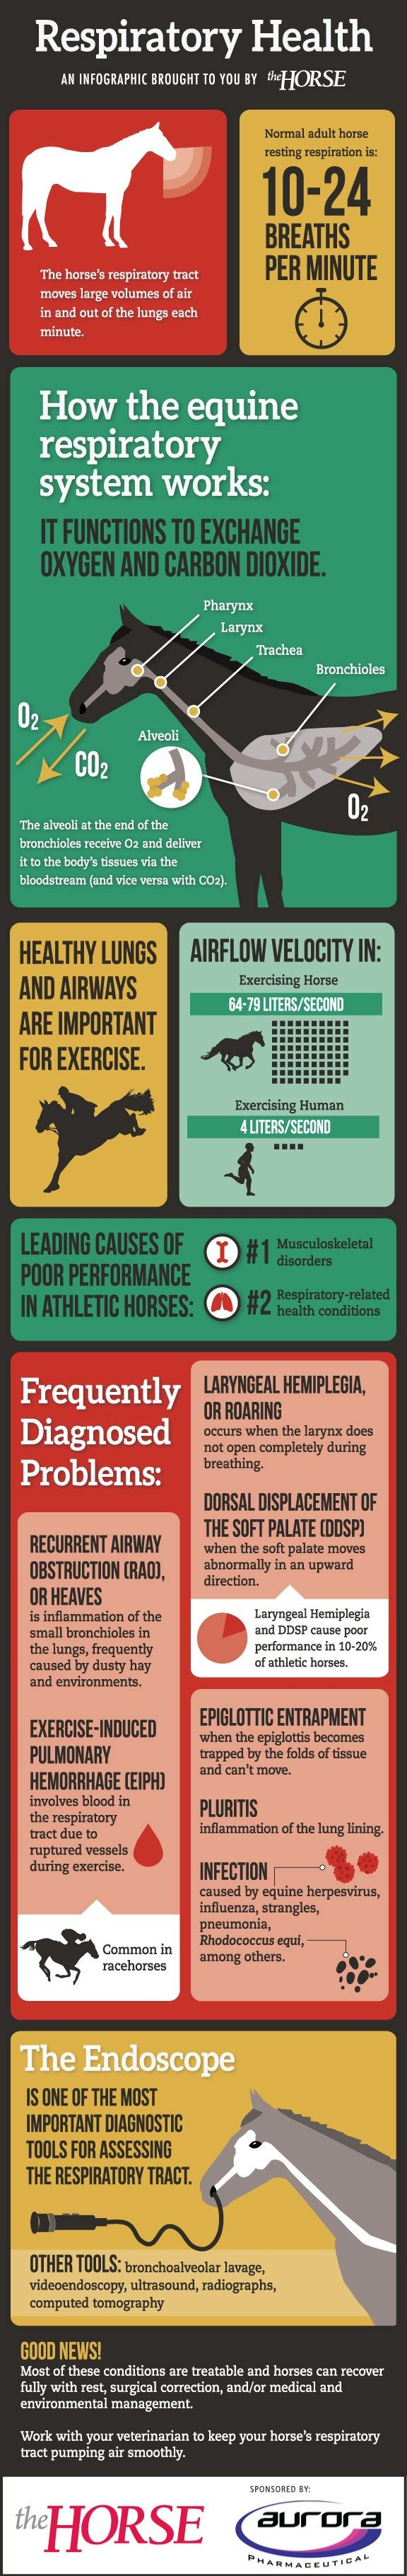 Infographic: Respiratory Health